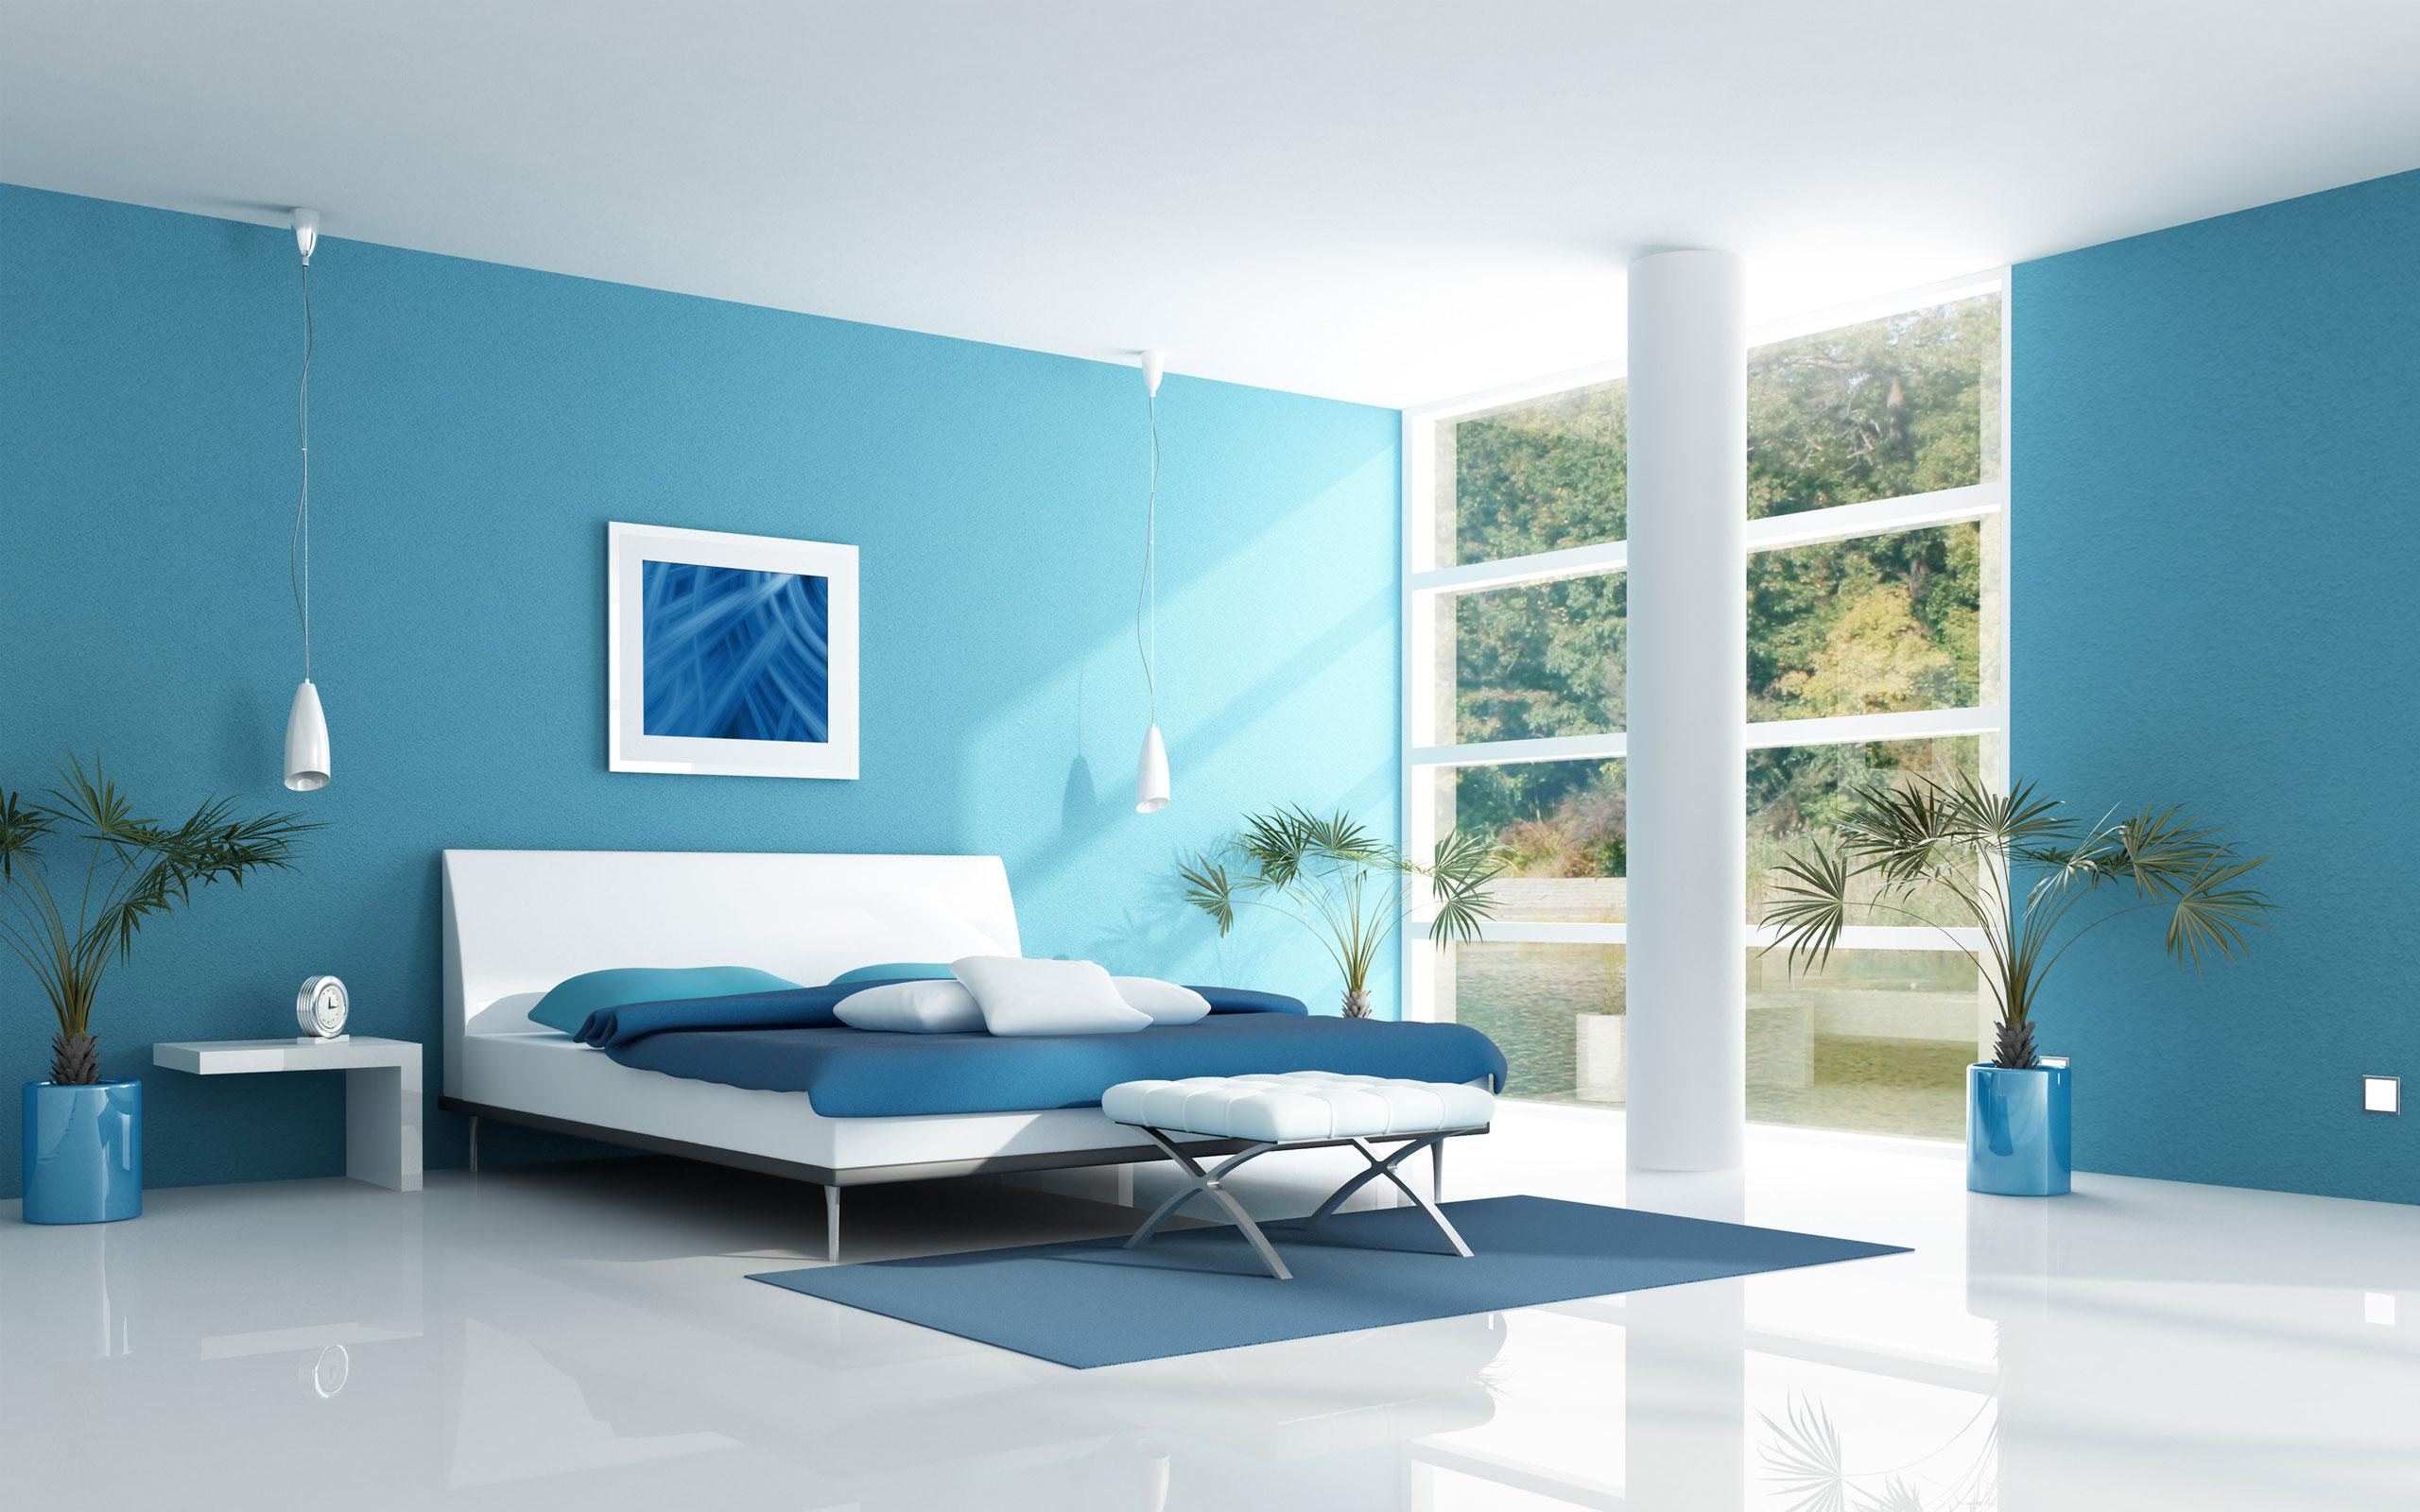 cashew heights interior design by krome reno